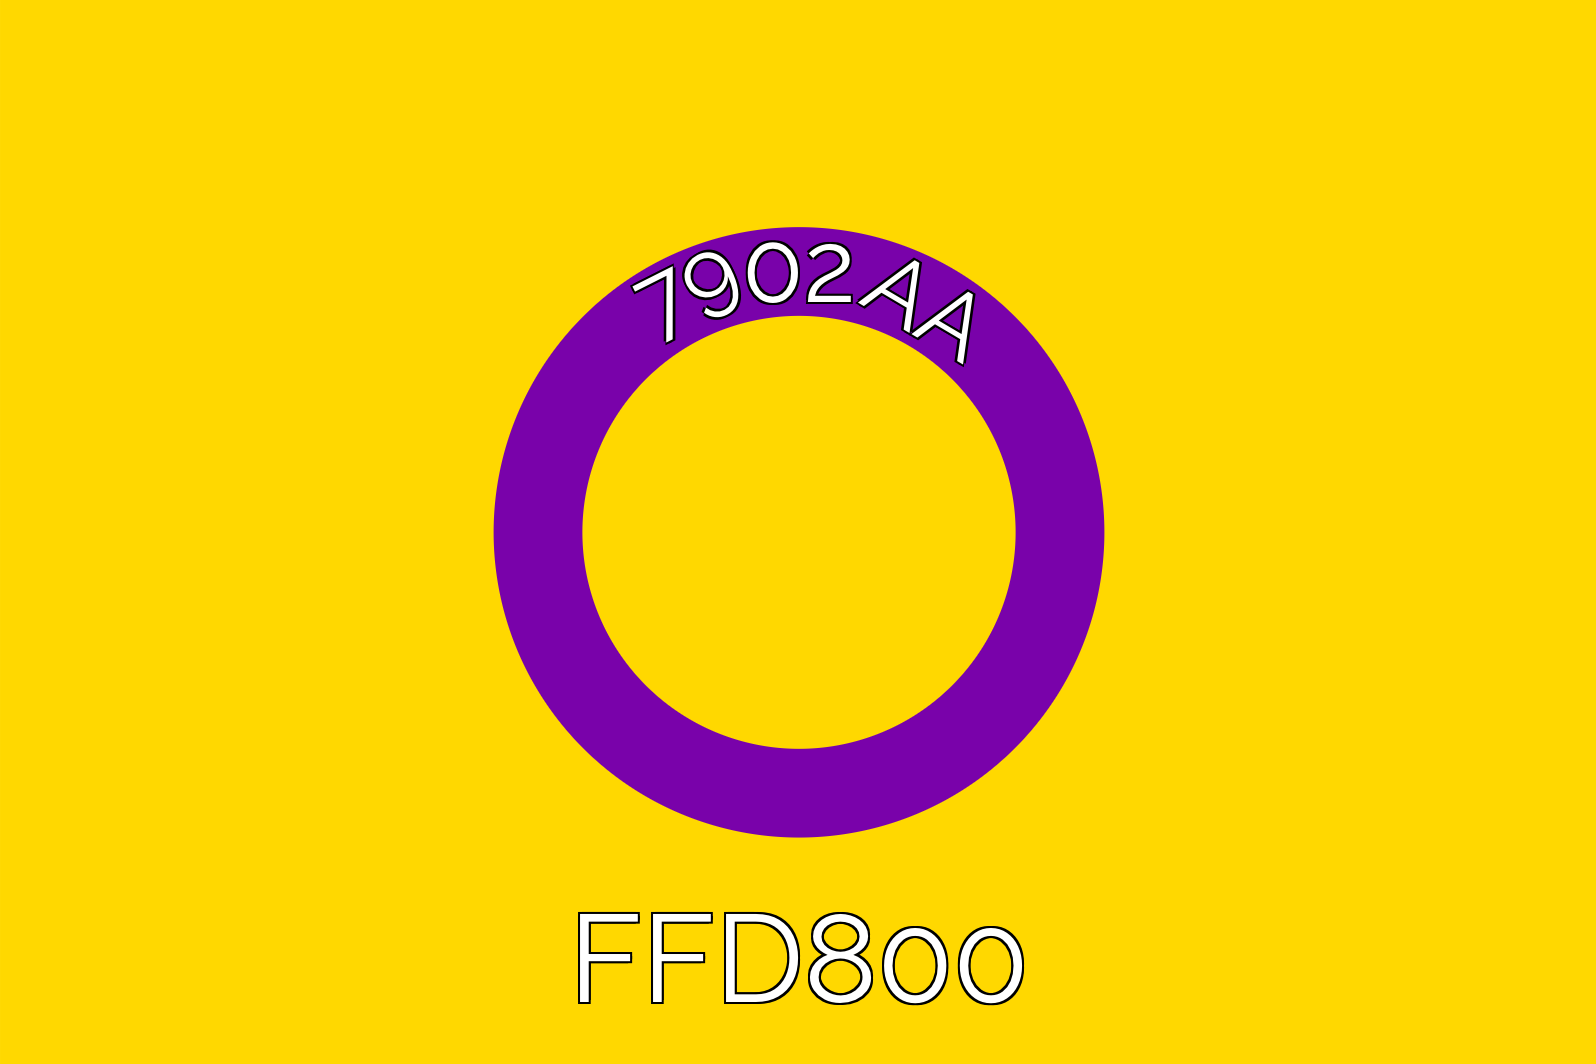 The intersex Pride flag.